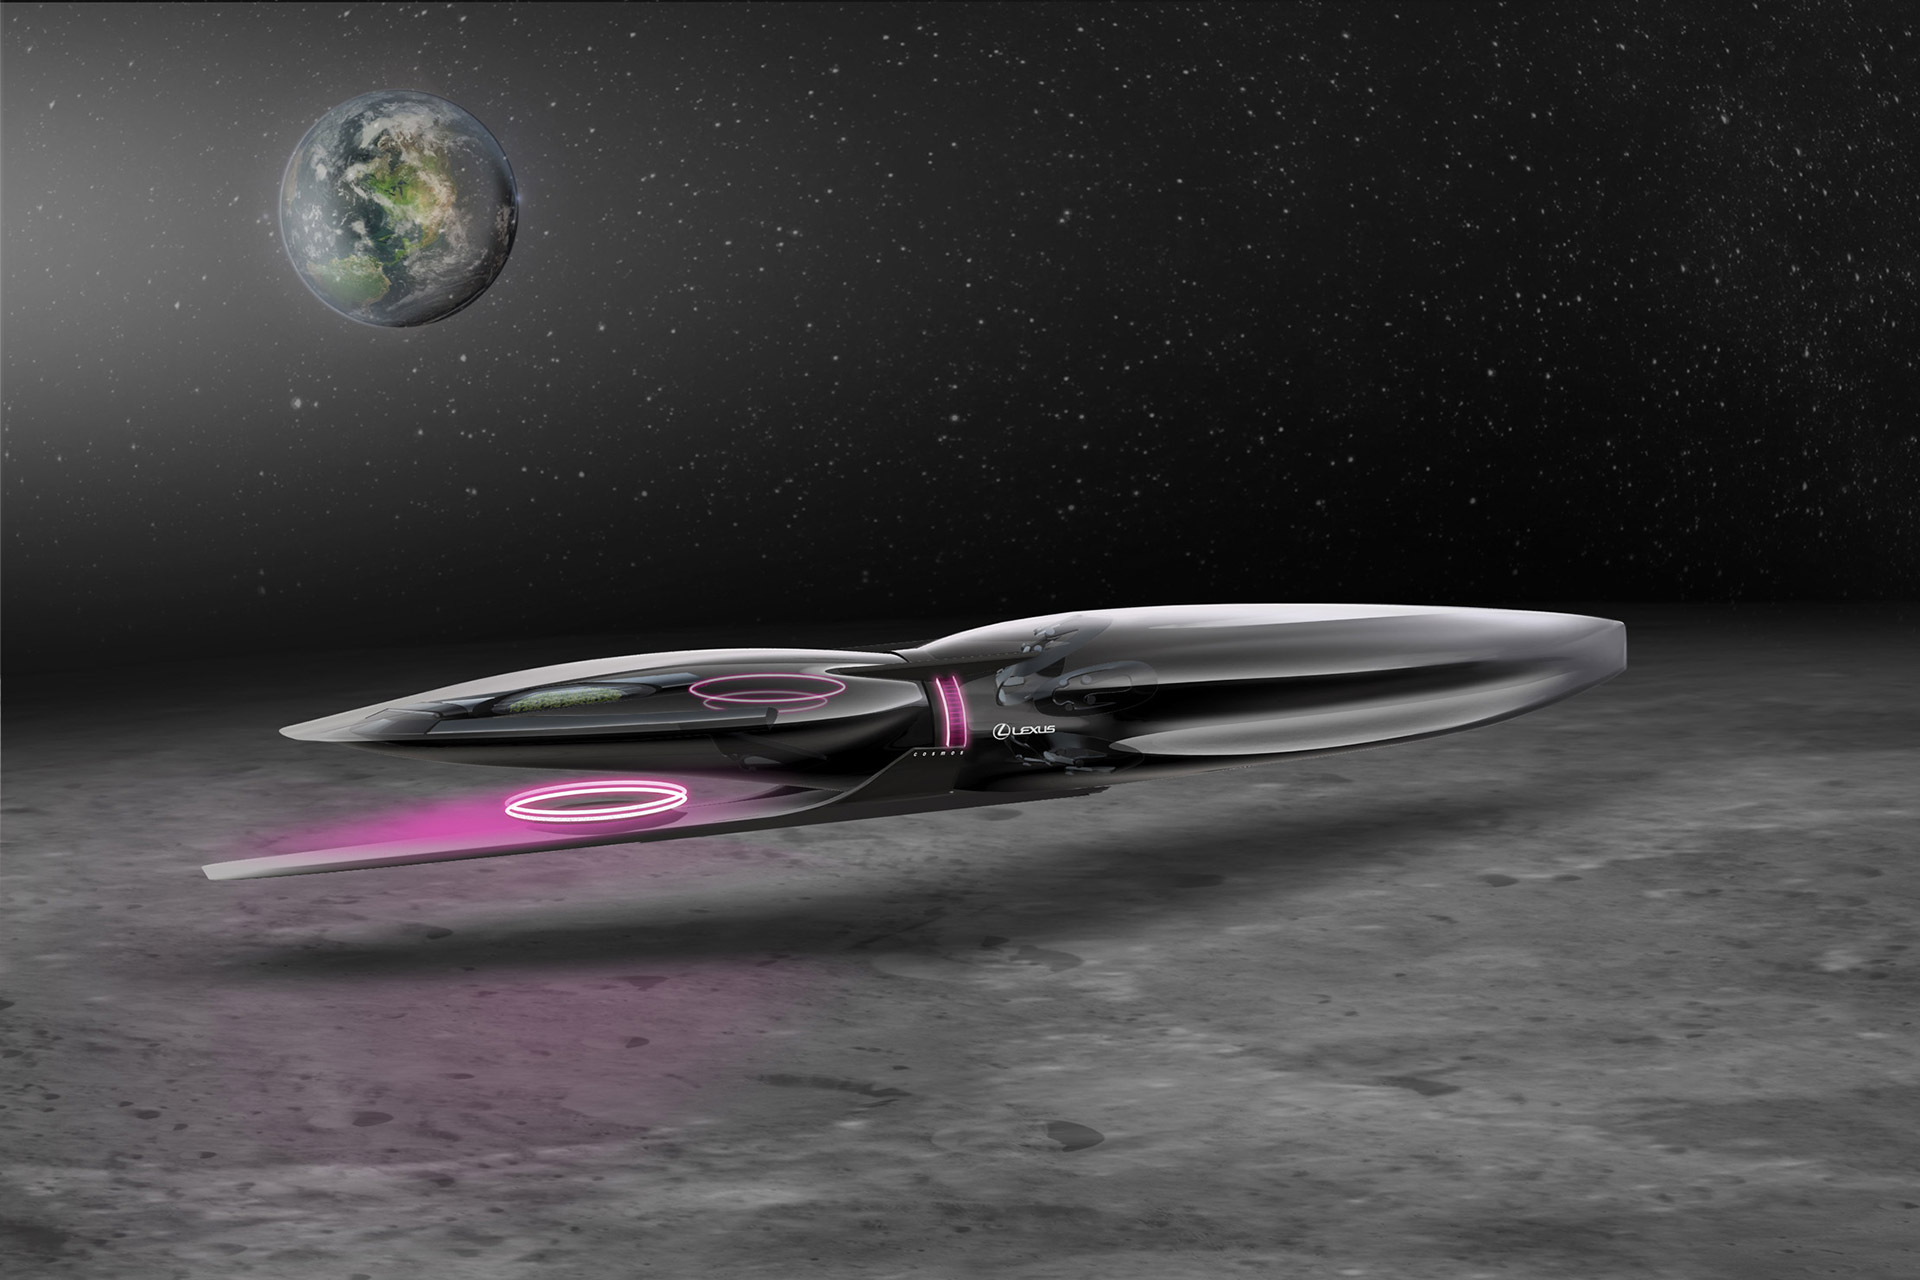 Lexus Space Vehicles